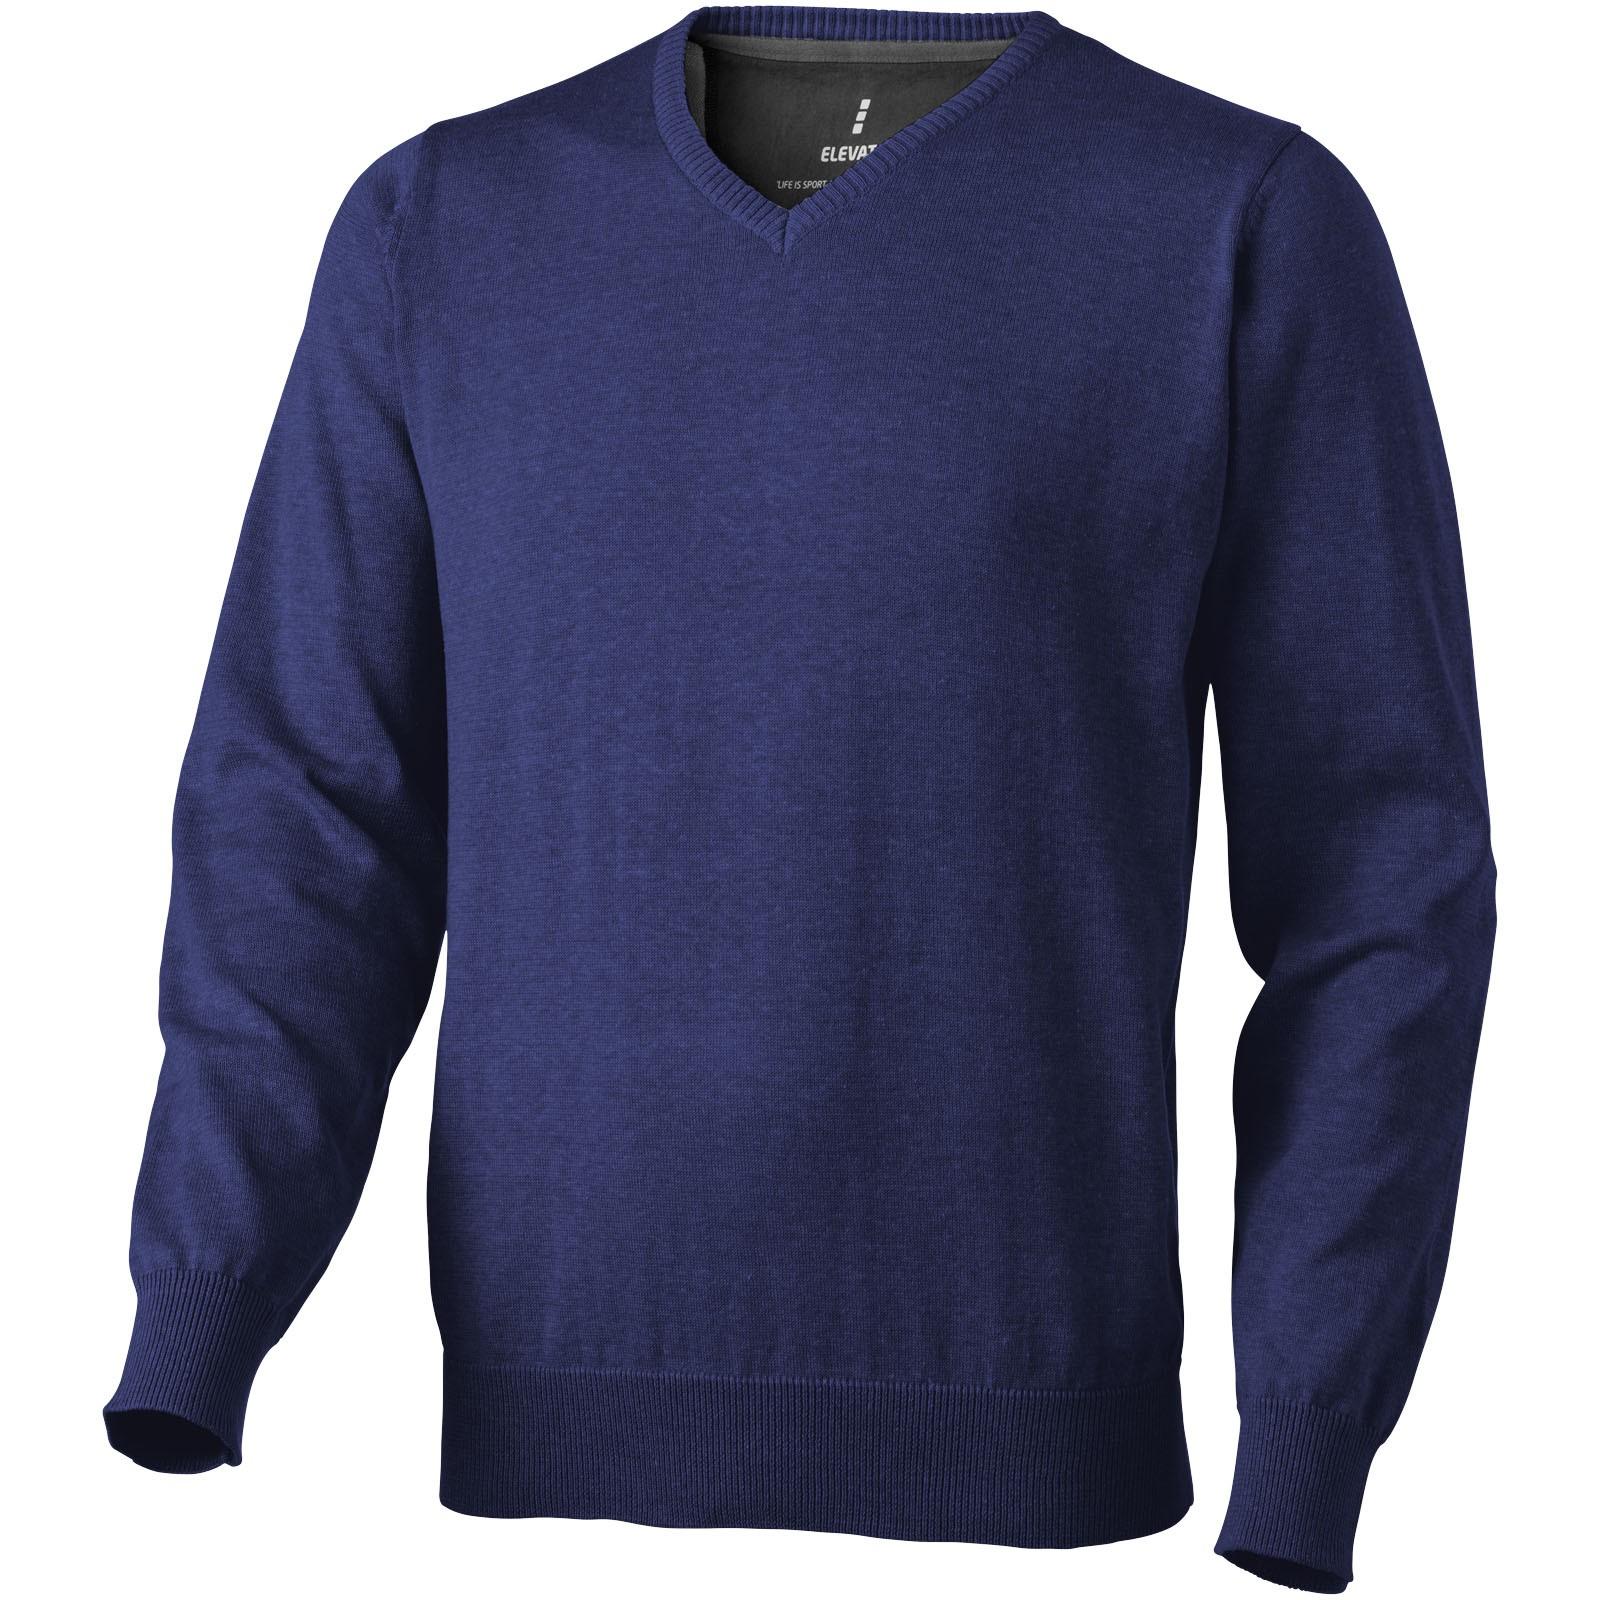 Spruce V-neck pullover - Navy / L